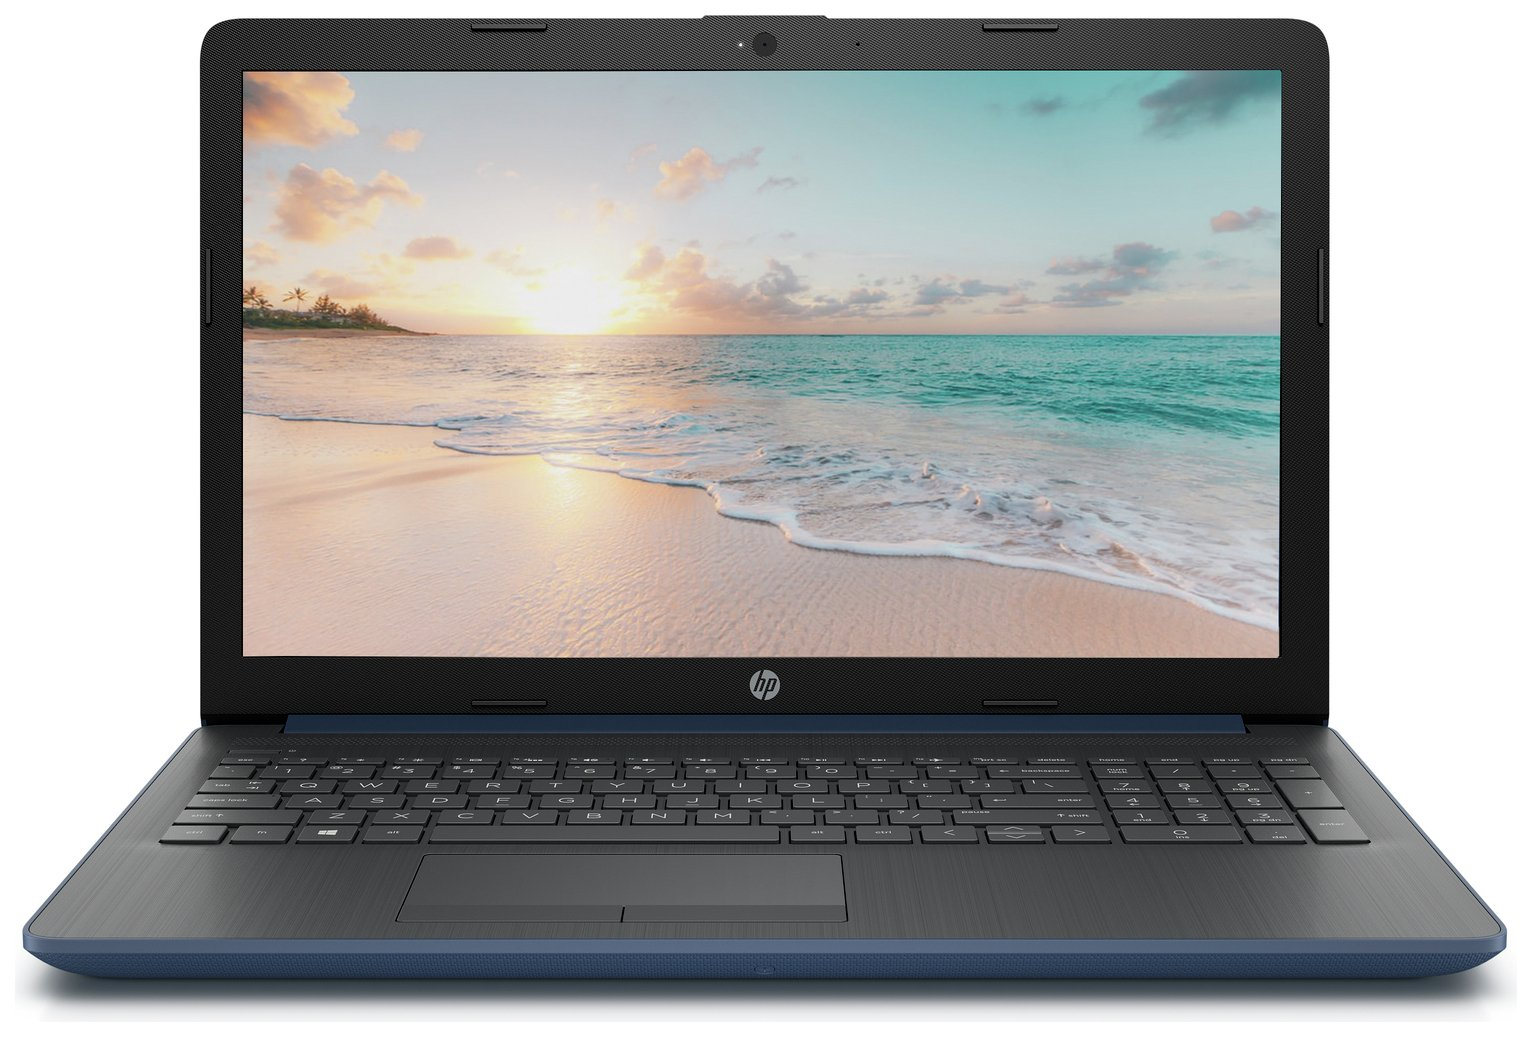 HP 15.6in AMD A4 4GB 1TB Laptop - Blue